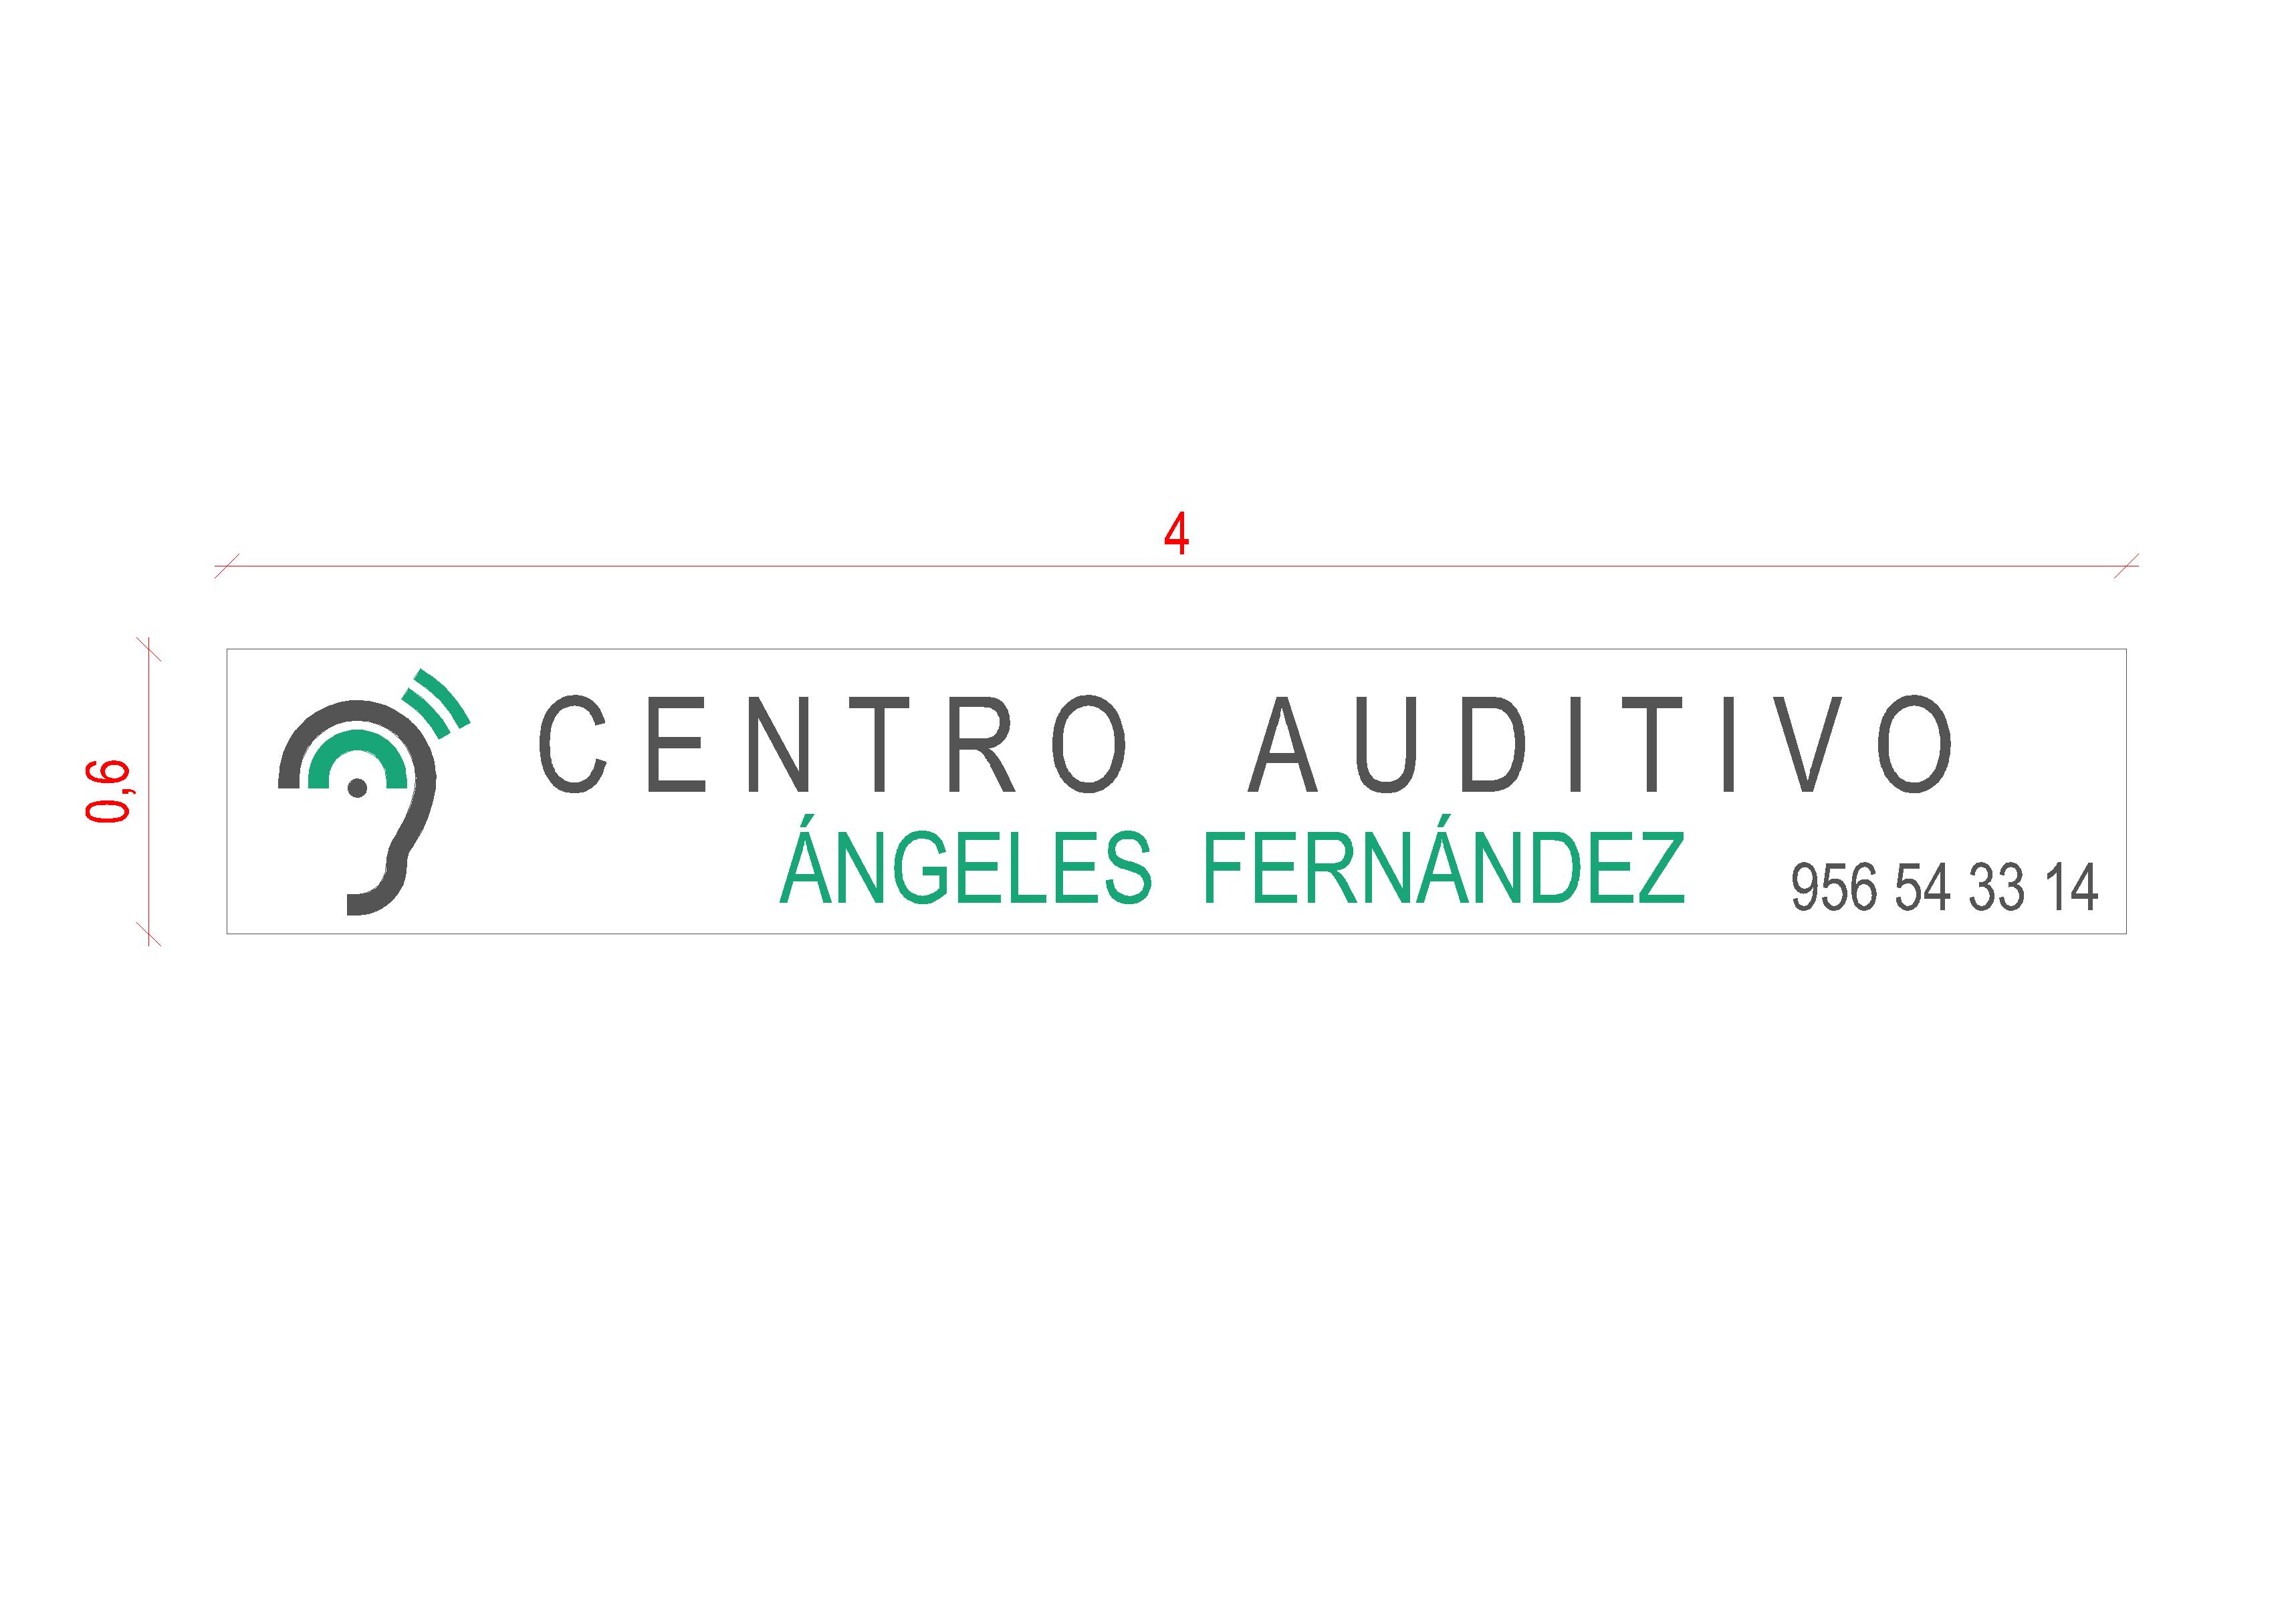 Centro Auditivo Ángeles Fernández